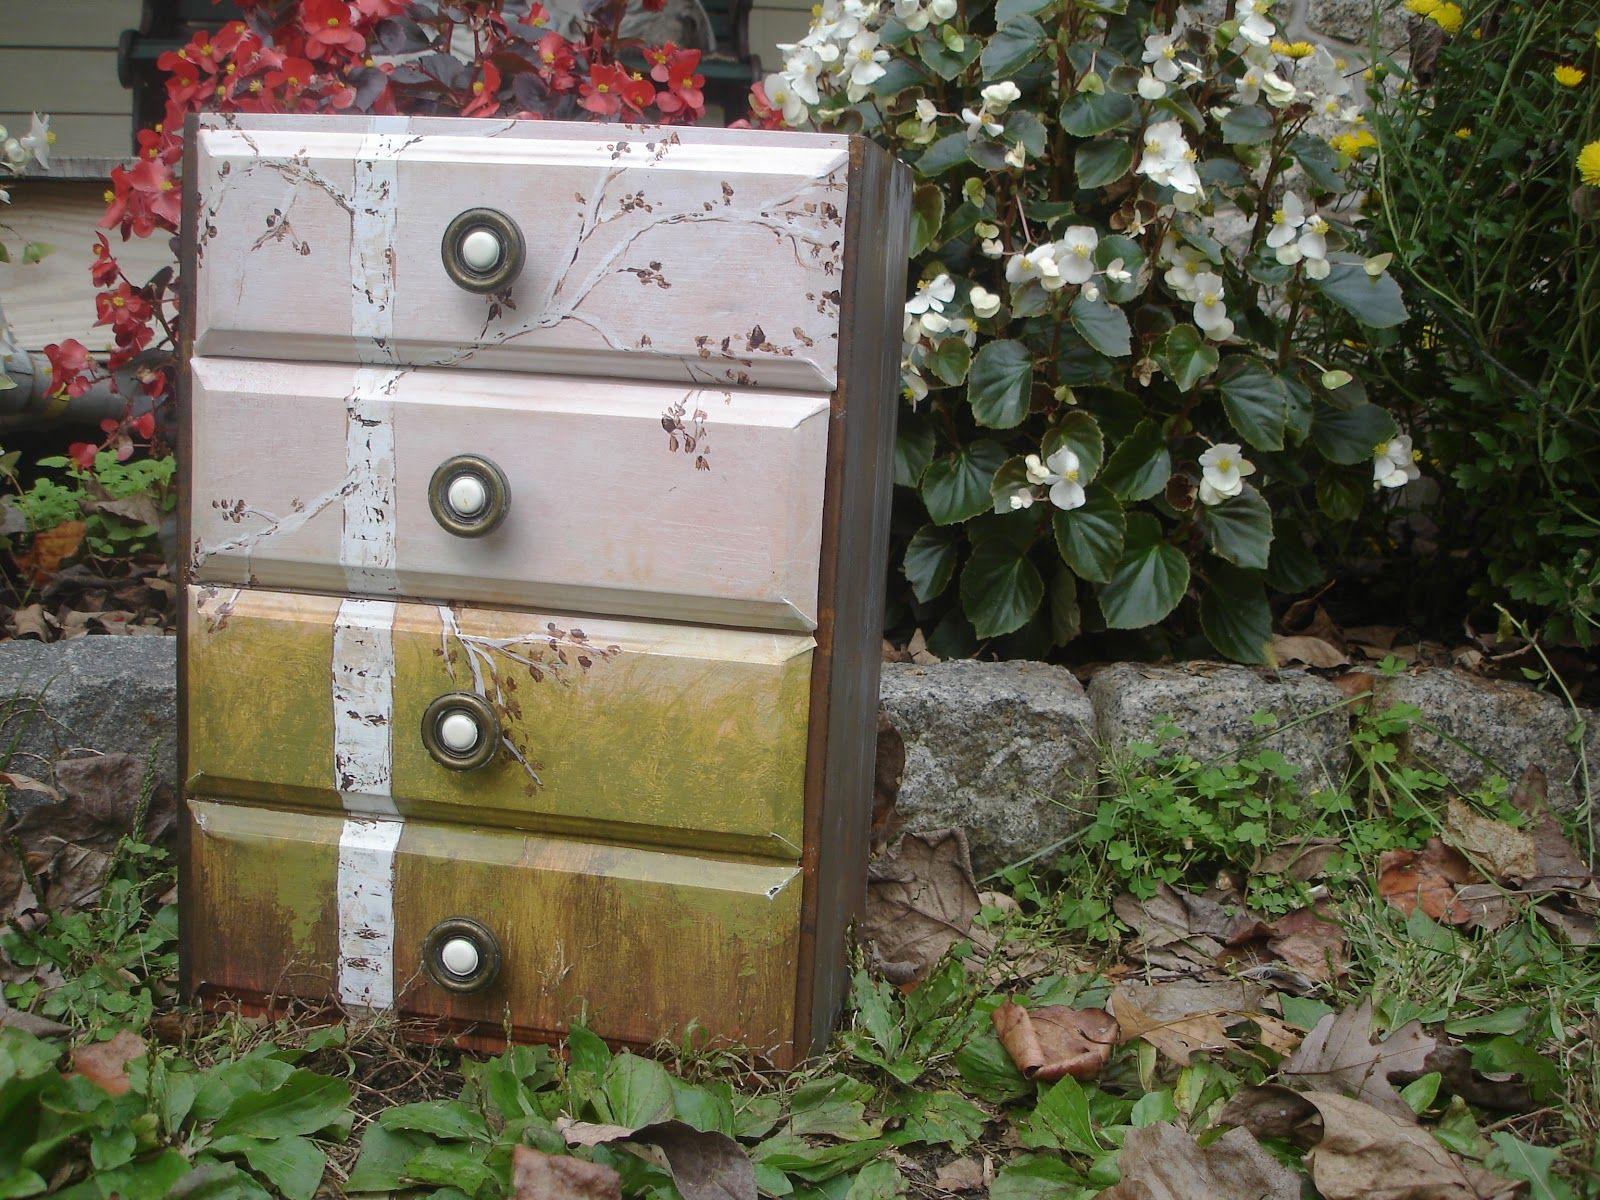 diy decoupage furniture. Decoupage Over Milk Paint (NEW Technique!) | D.I.Y Sweet Home Furniture Diy